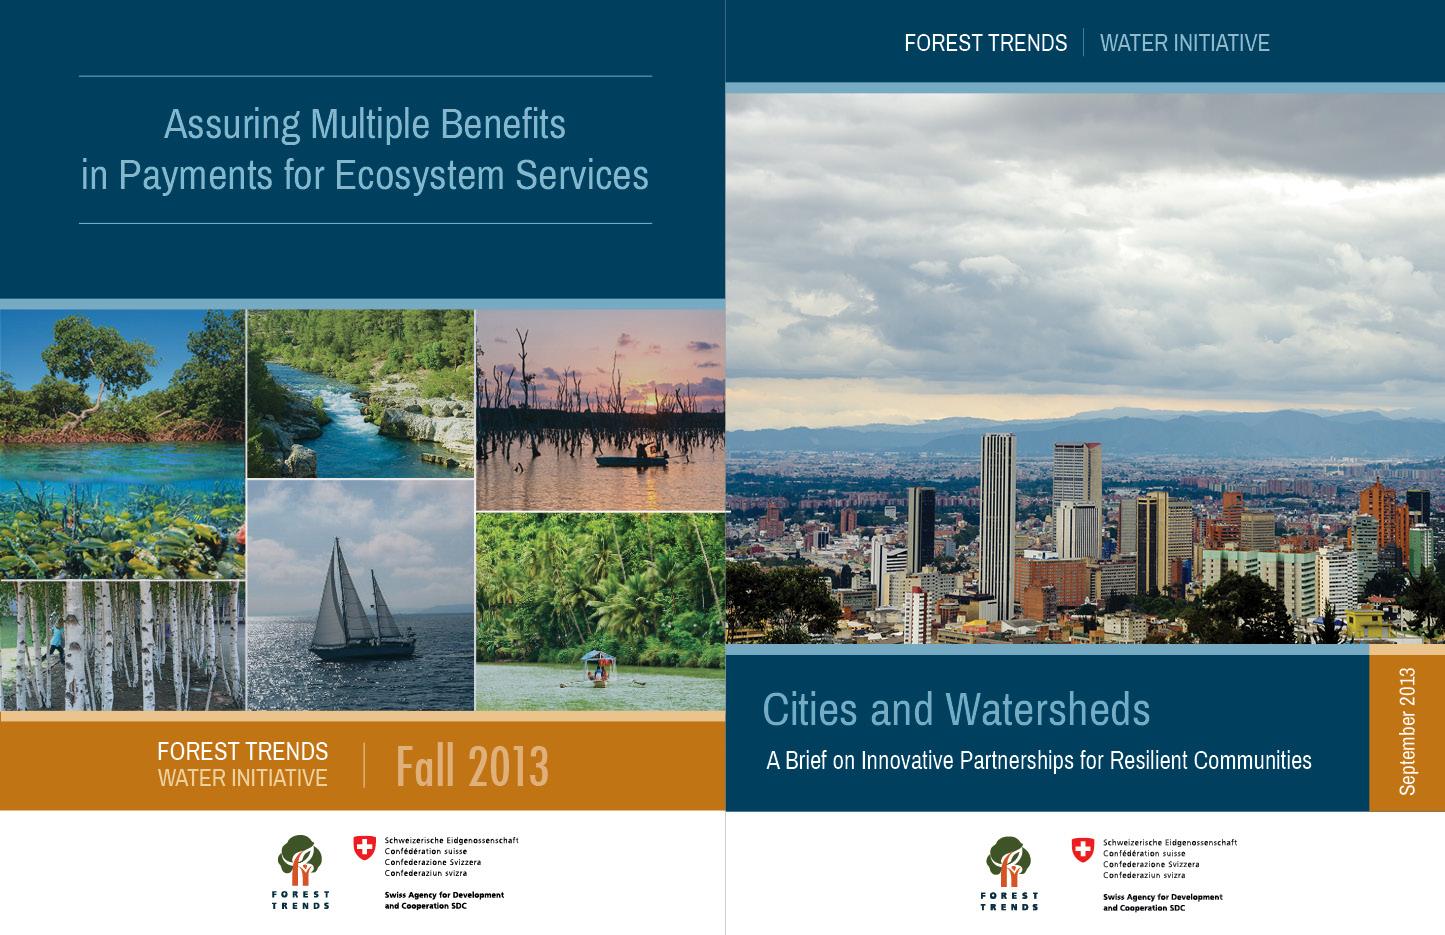 Water Initiative Cover Designs